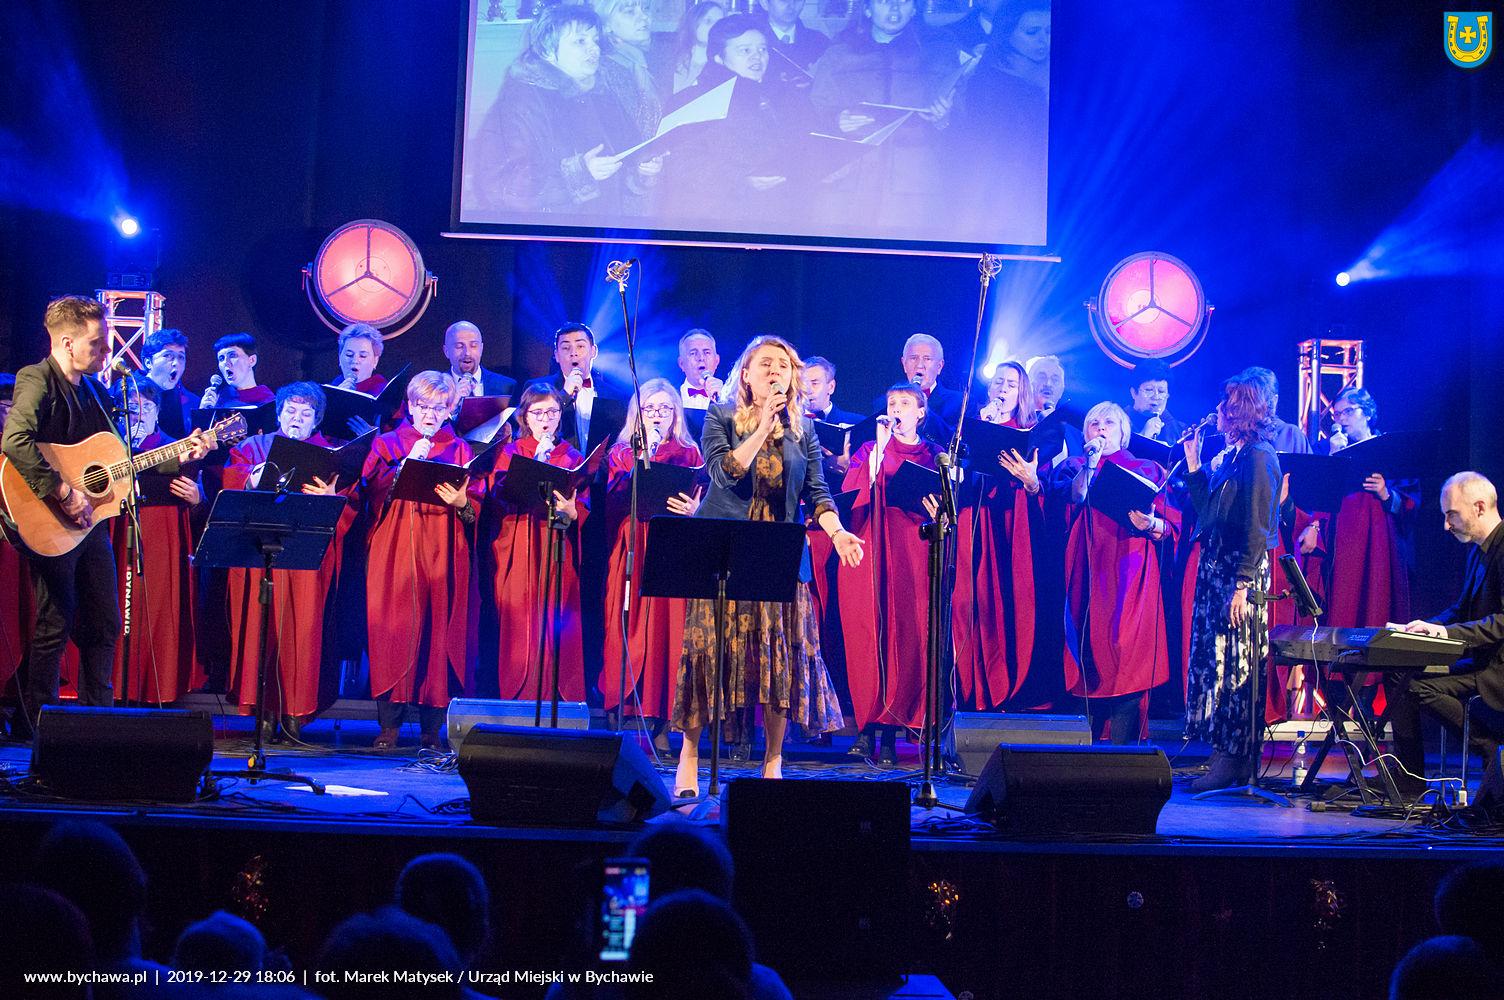 15 lat Chóru Simul Cantare w Bychawskim Centrum Kultury – uroczysta gala